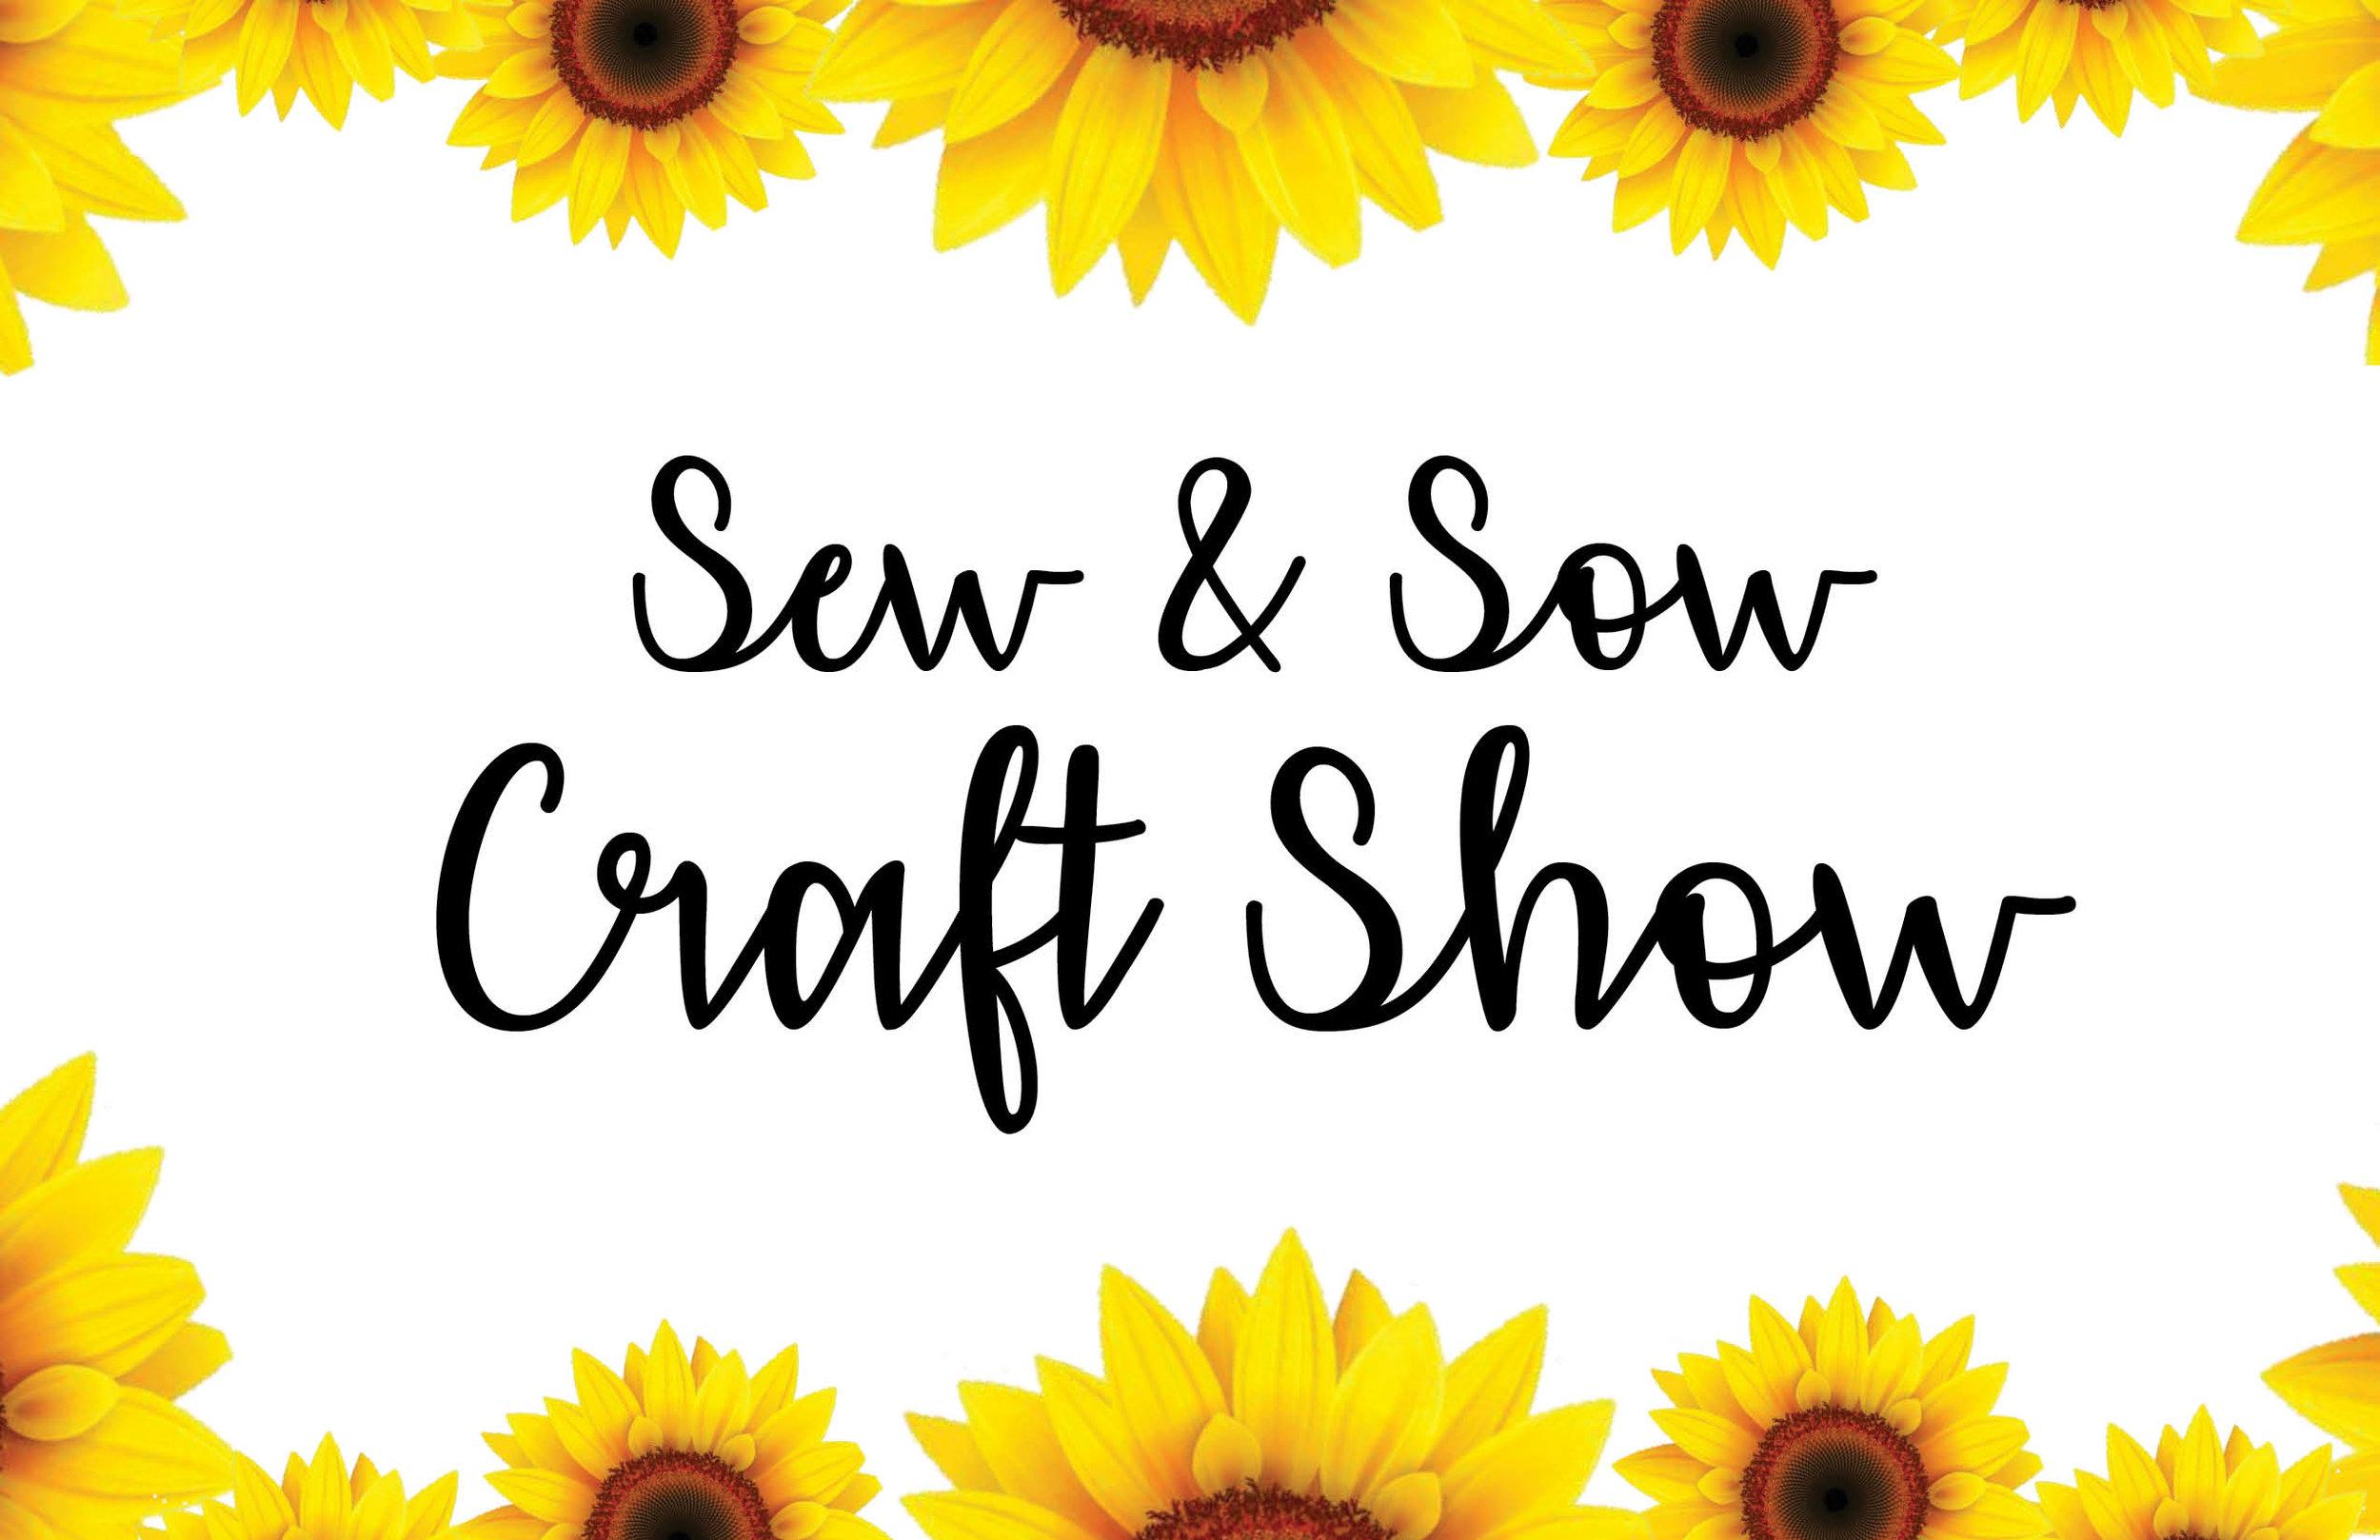 Sew_and_Sow-CraftShow.jpg